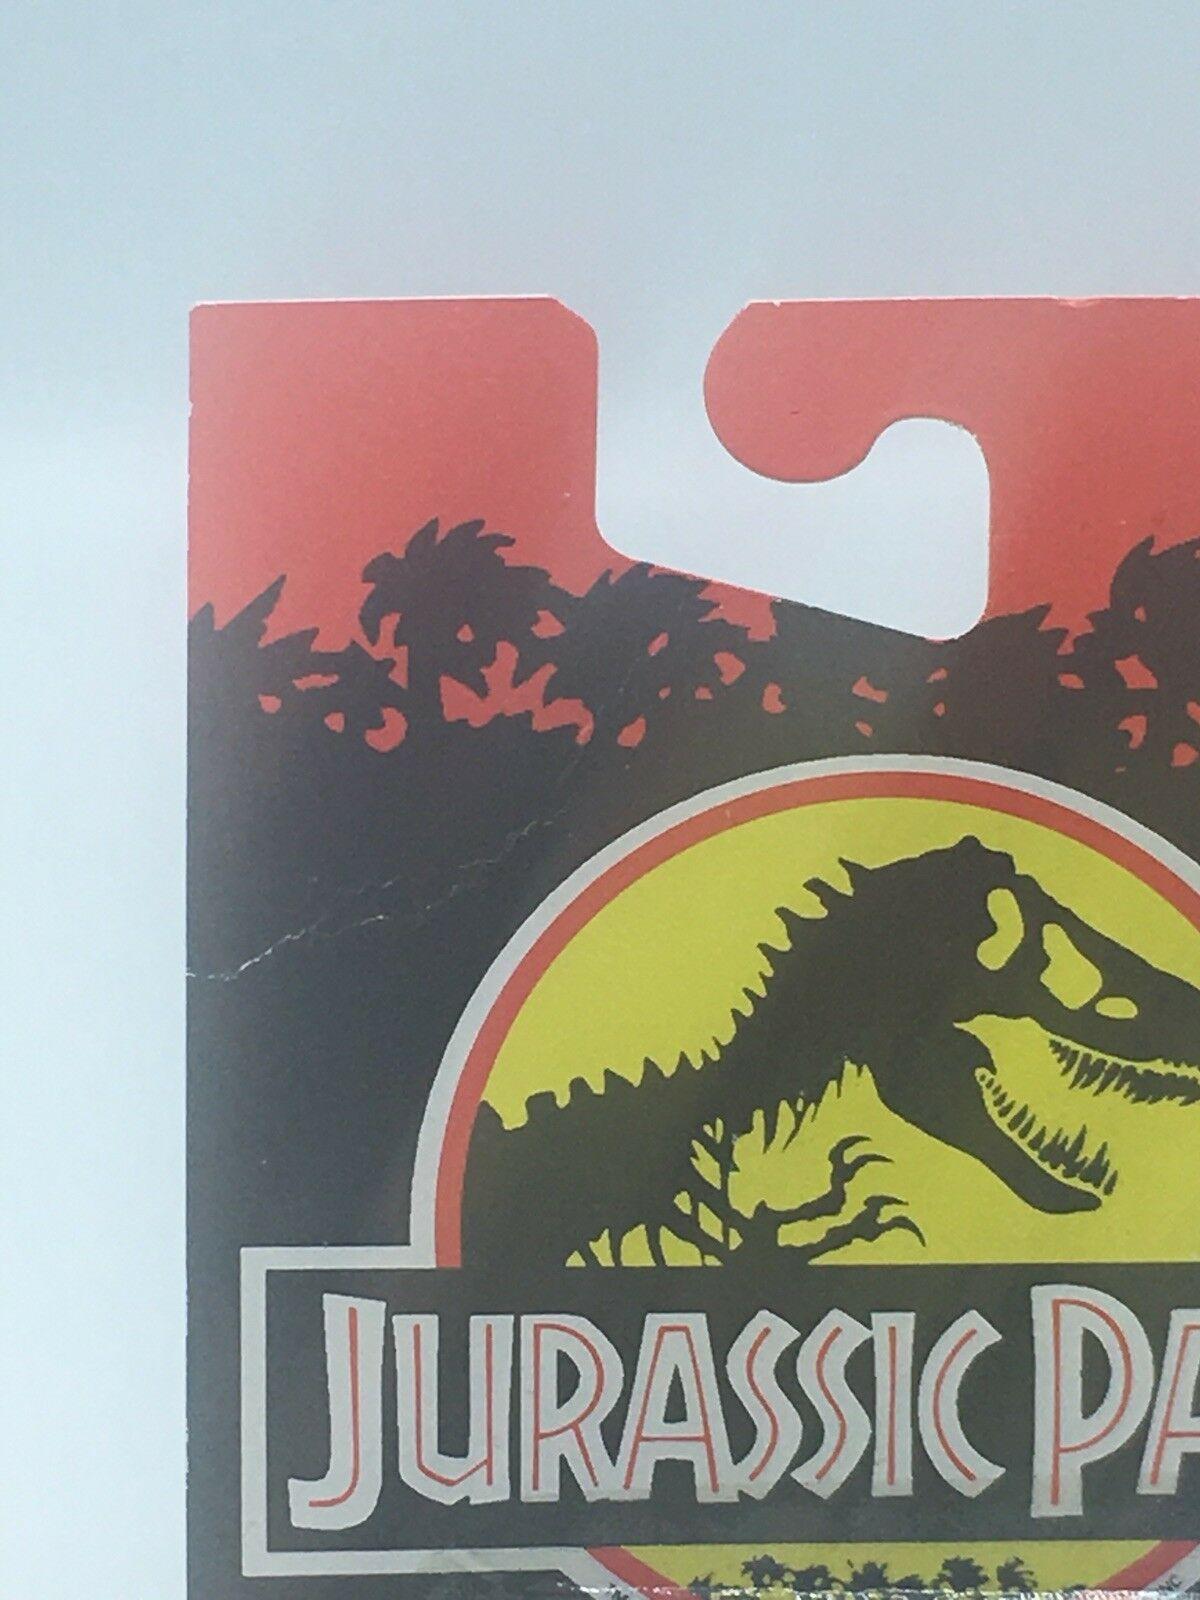 Jurassic Park Triceratops Enamel Pin 1992 Ace Novelty Dinosaur image 2